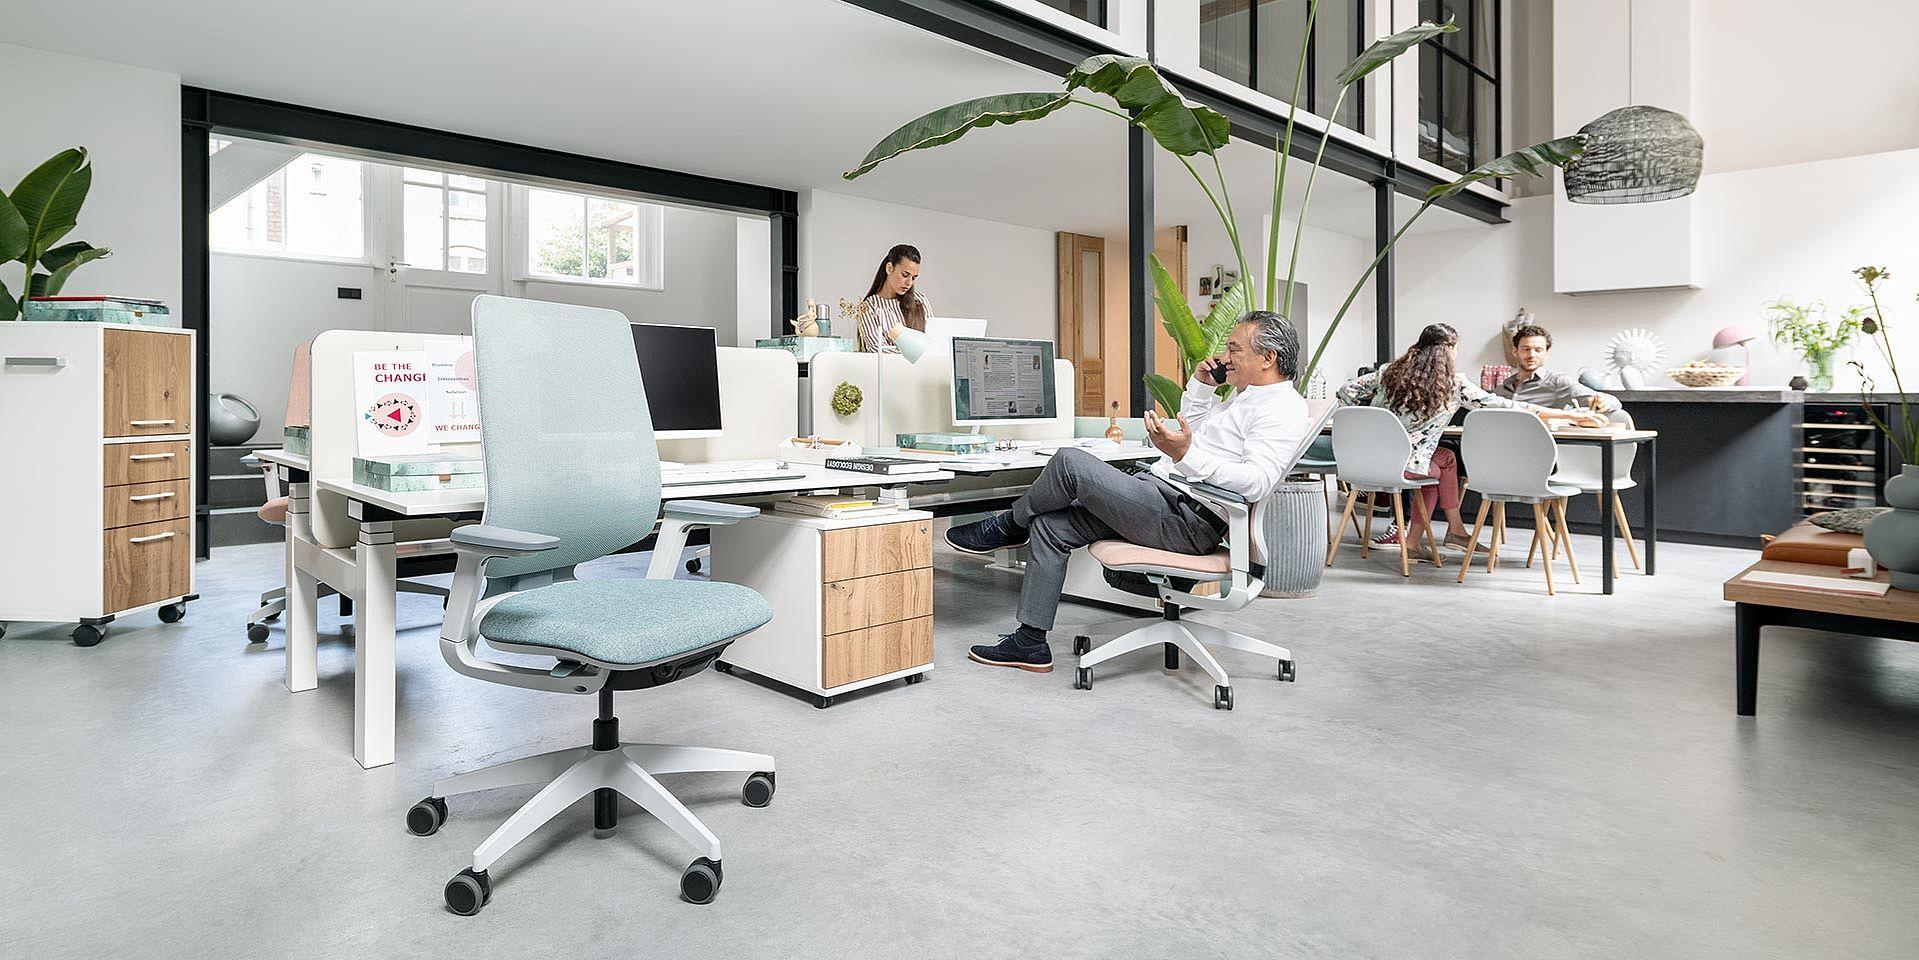 https://www.a4amenagement.com/wp-content/uploads/2020/01/ergonomie-fauteuil-travail.jpg